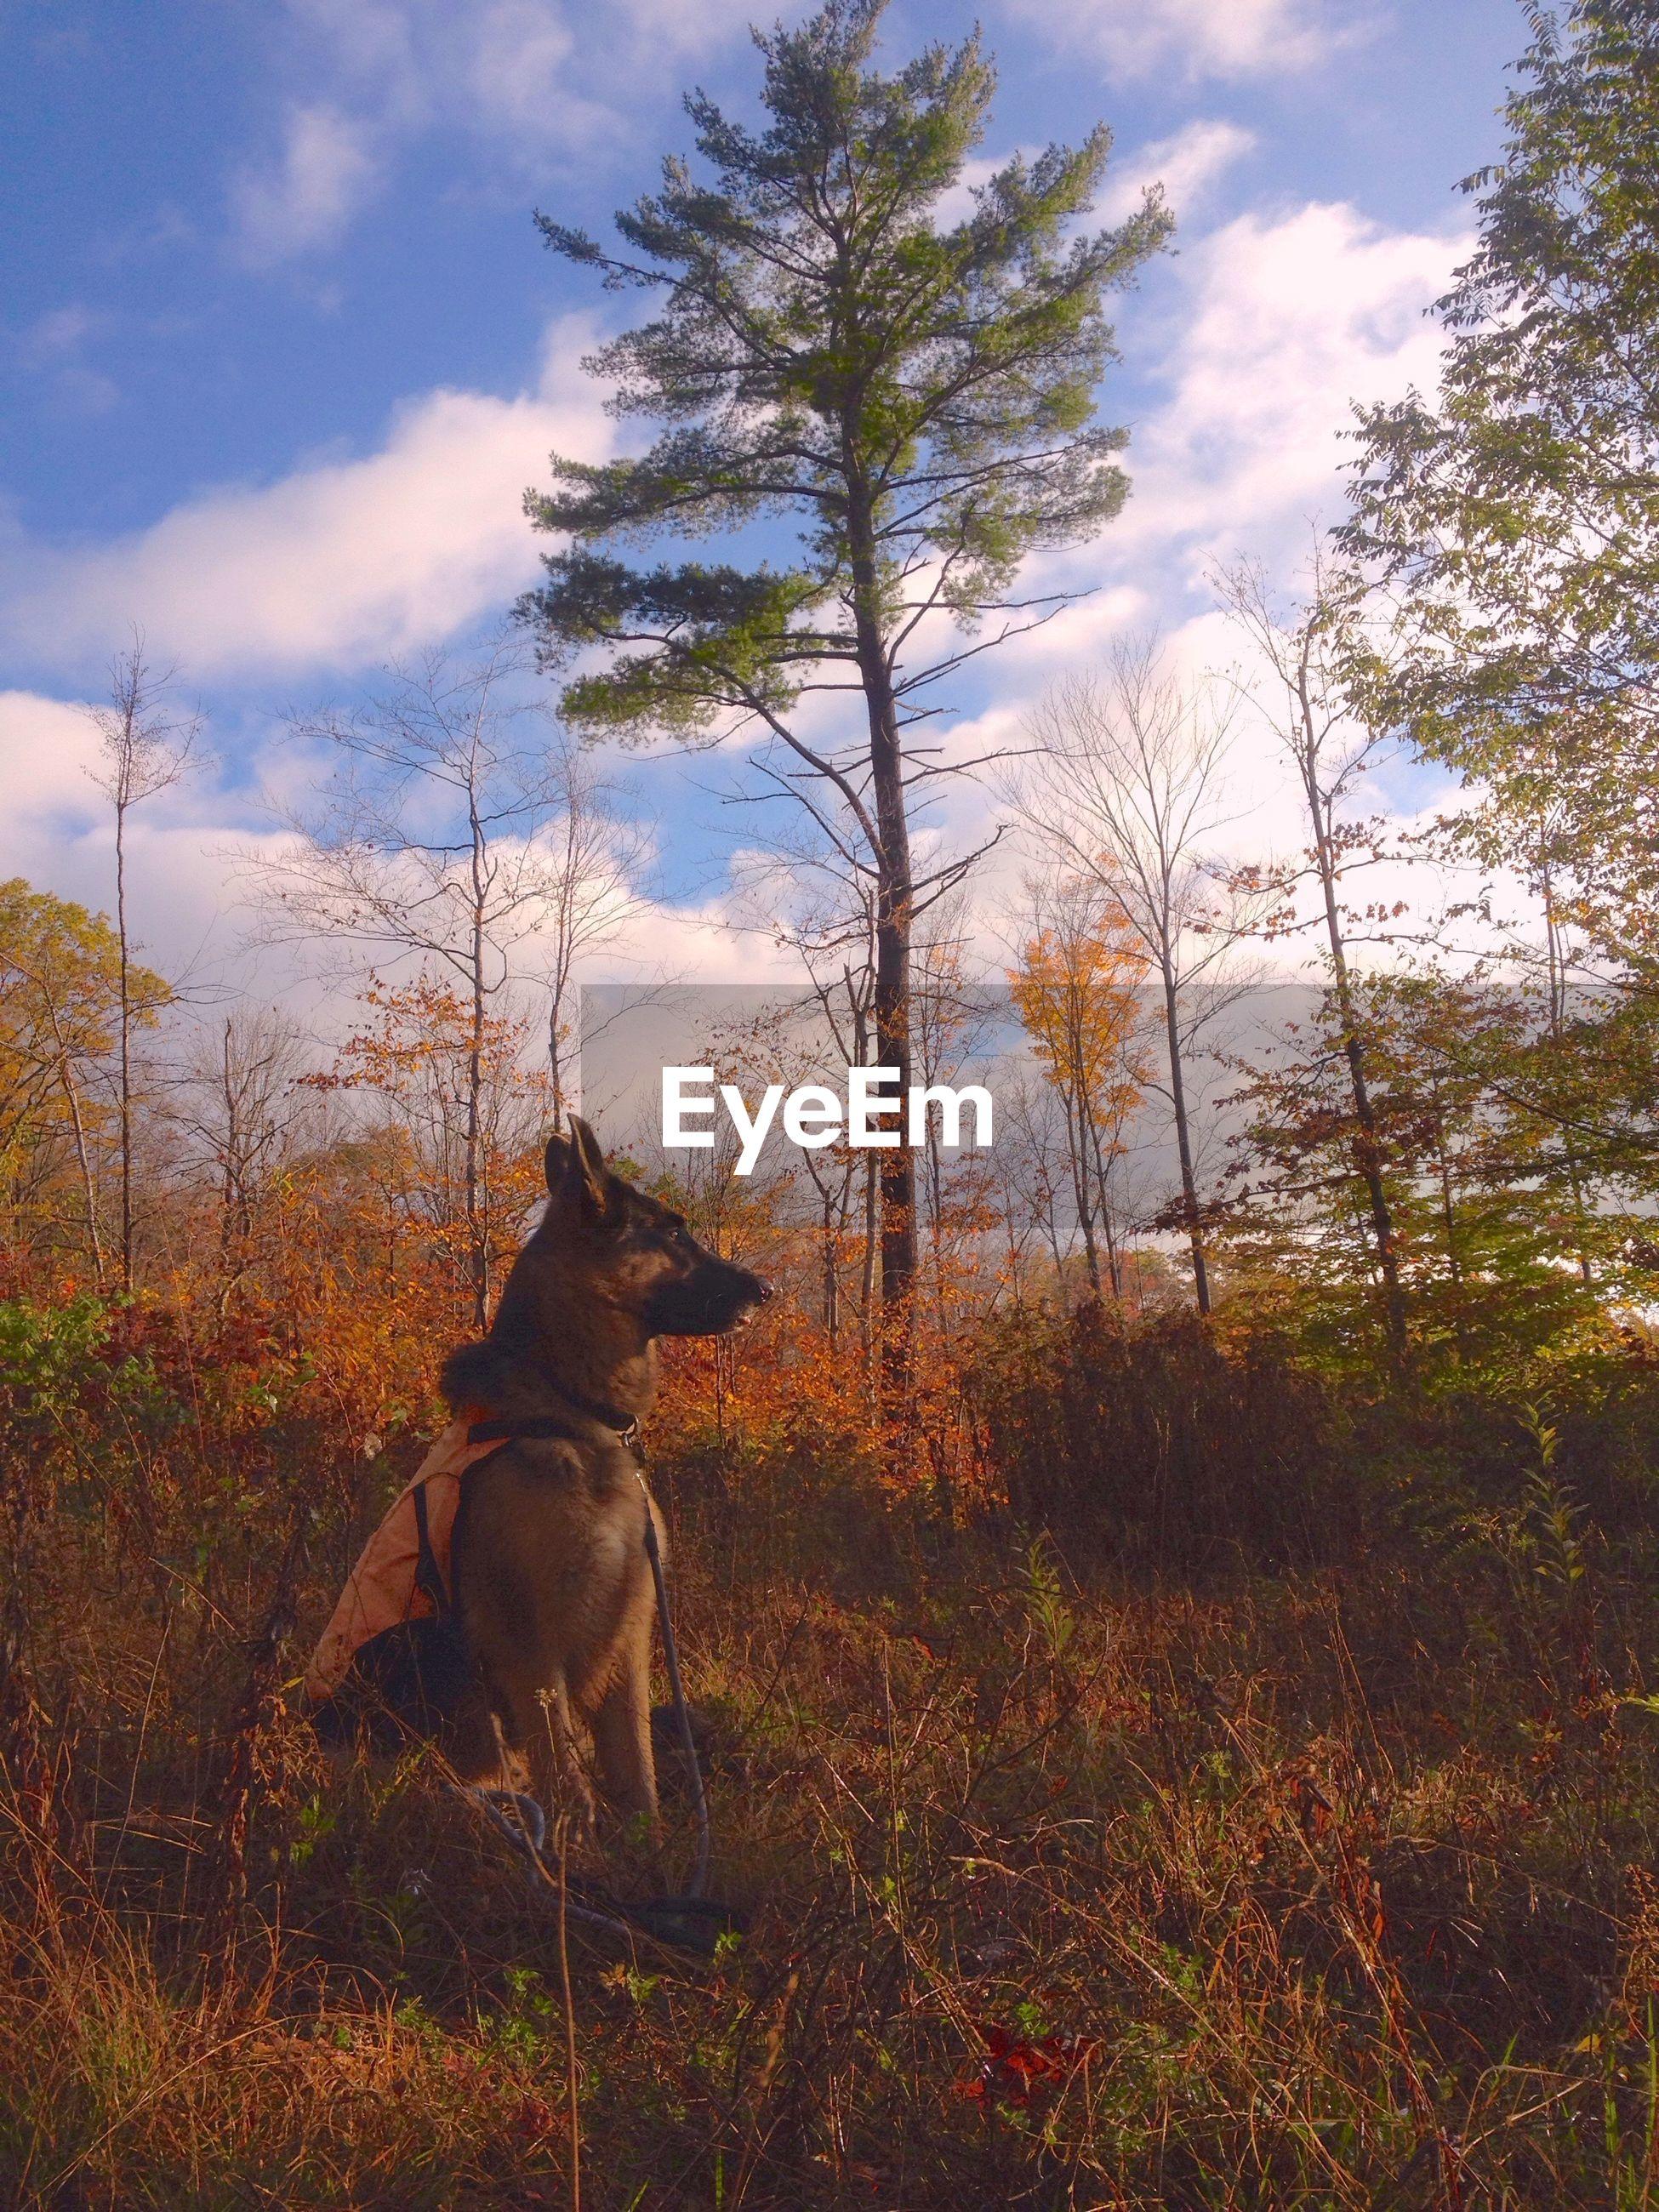 Dog on landscape against trees